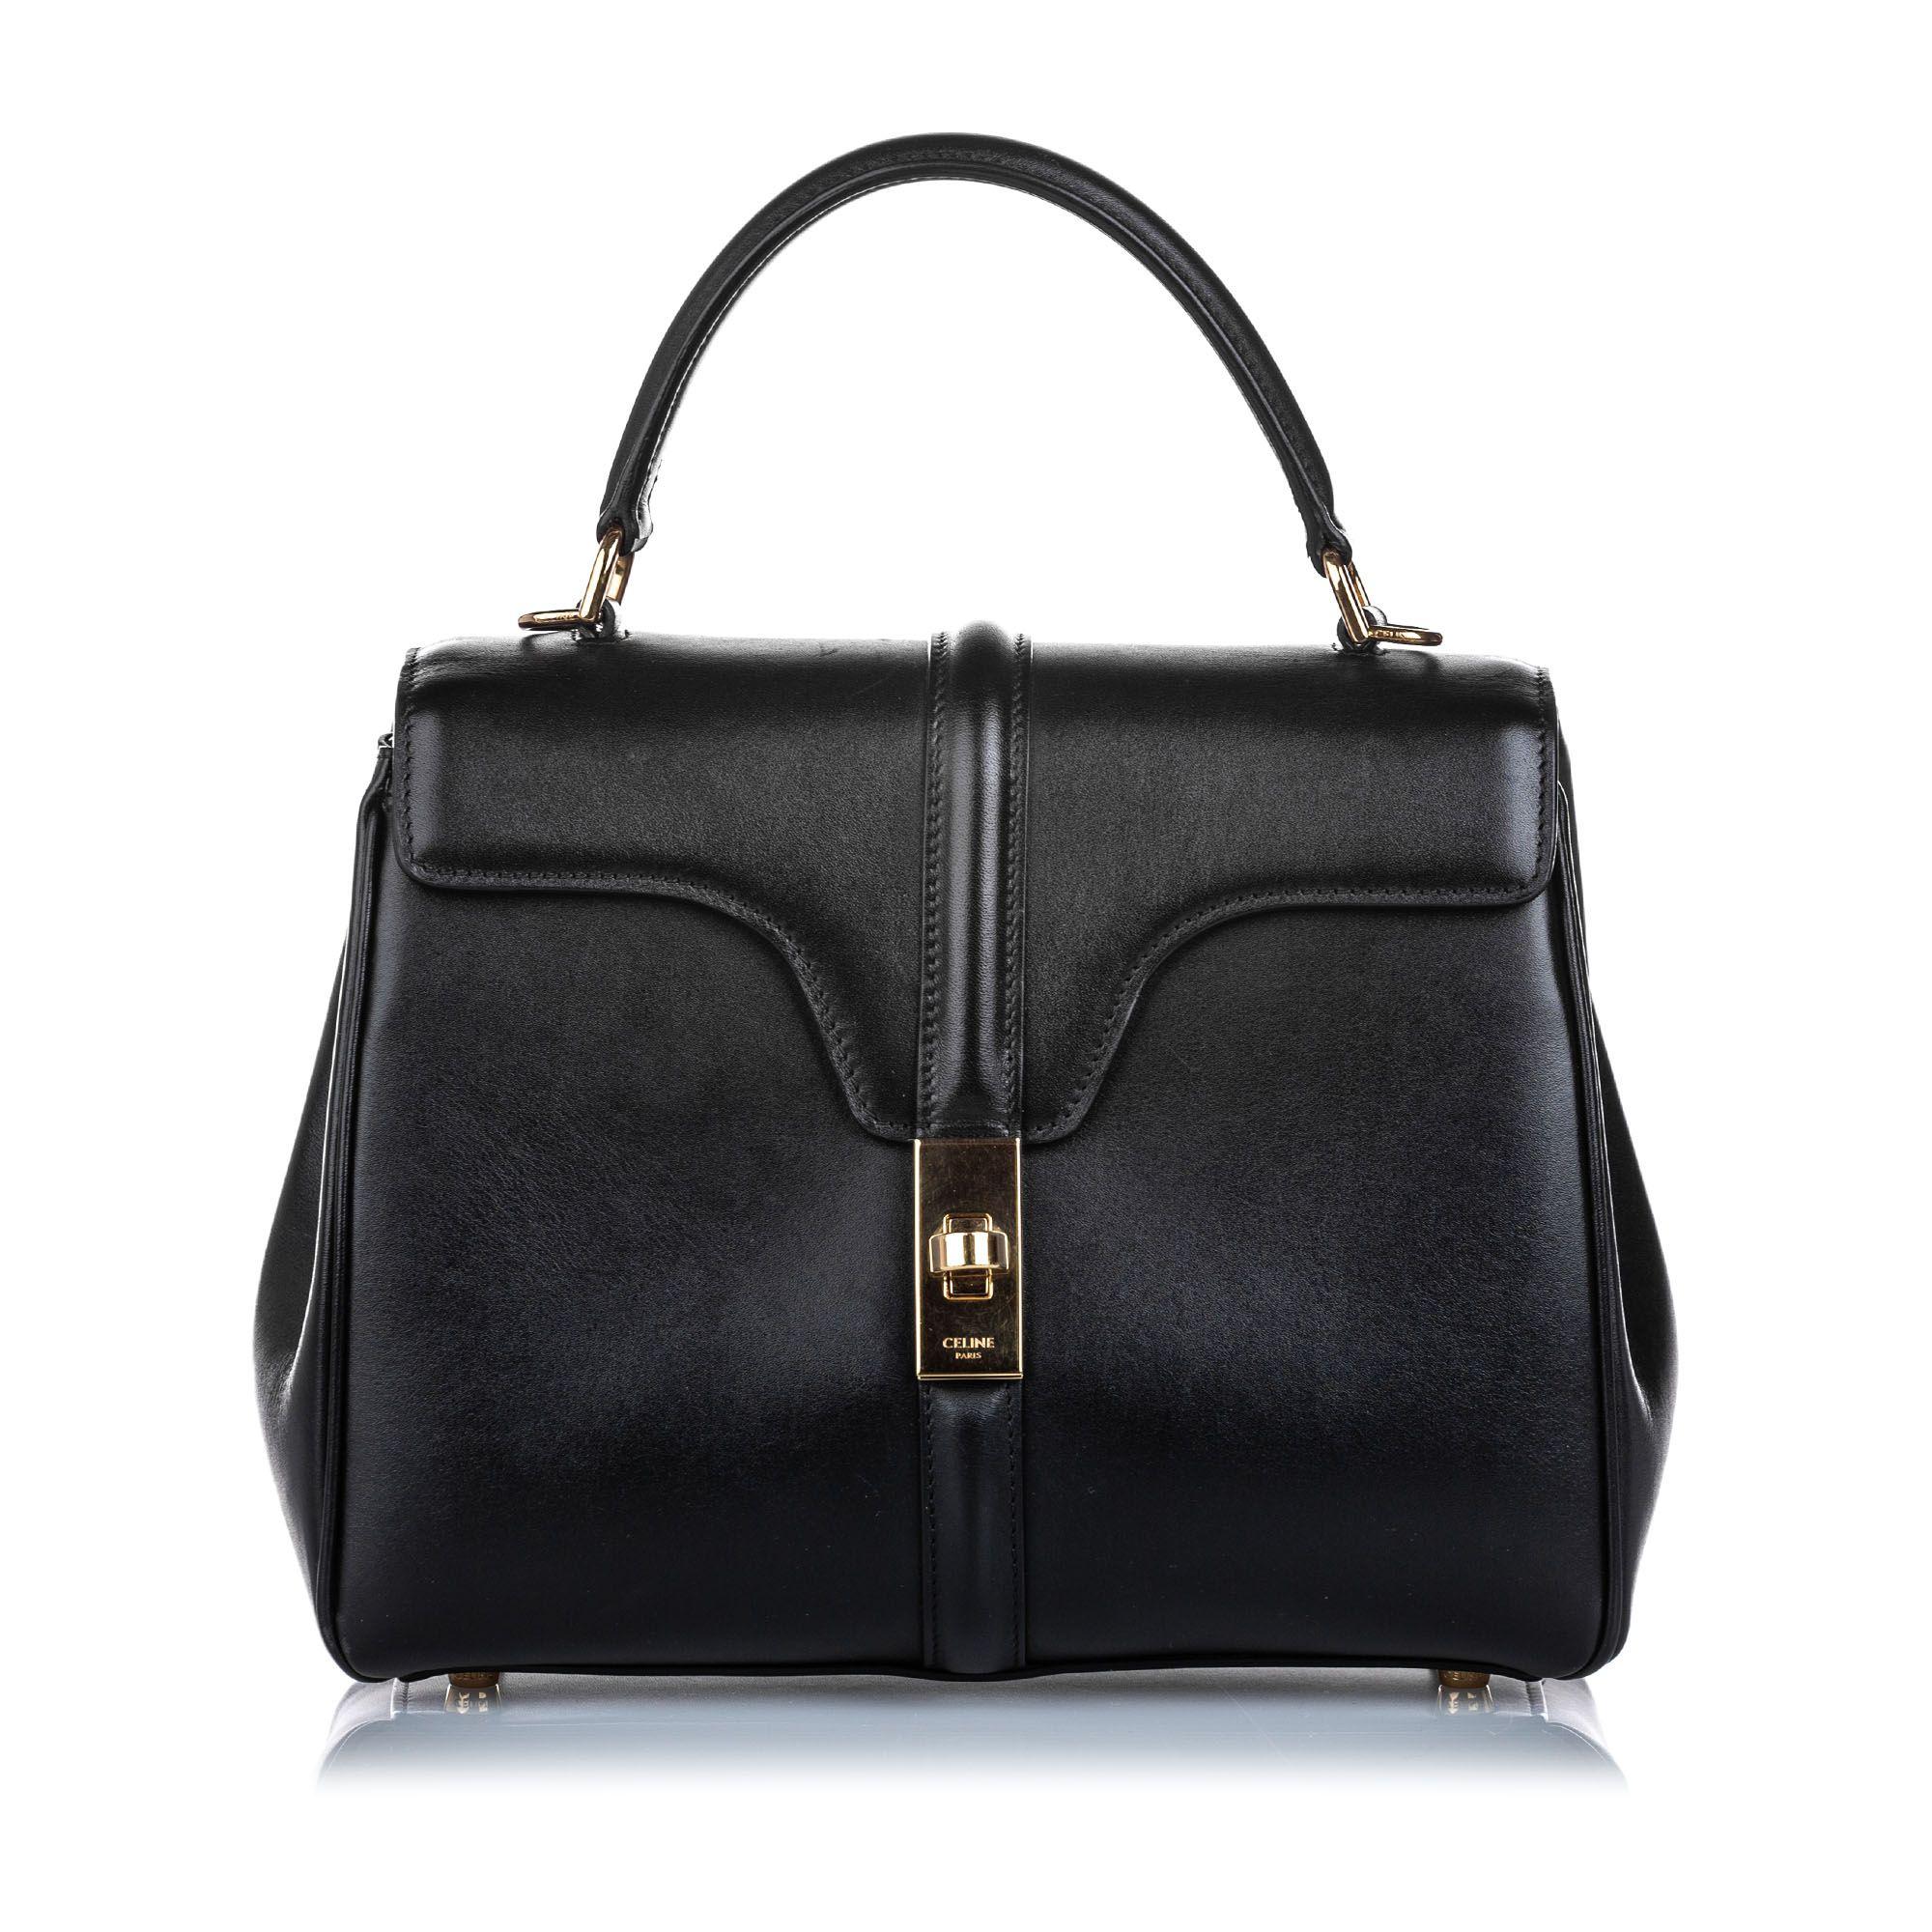 Vintage Celine Leather Small 16 Bag Black